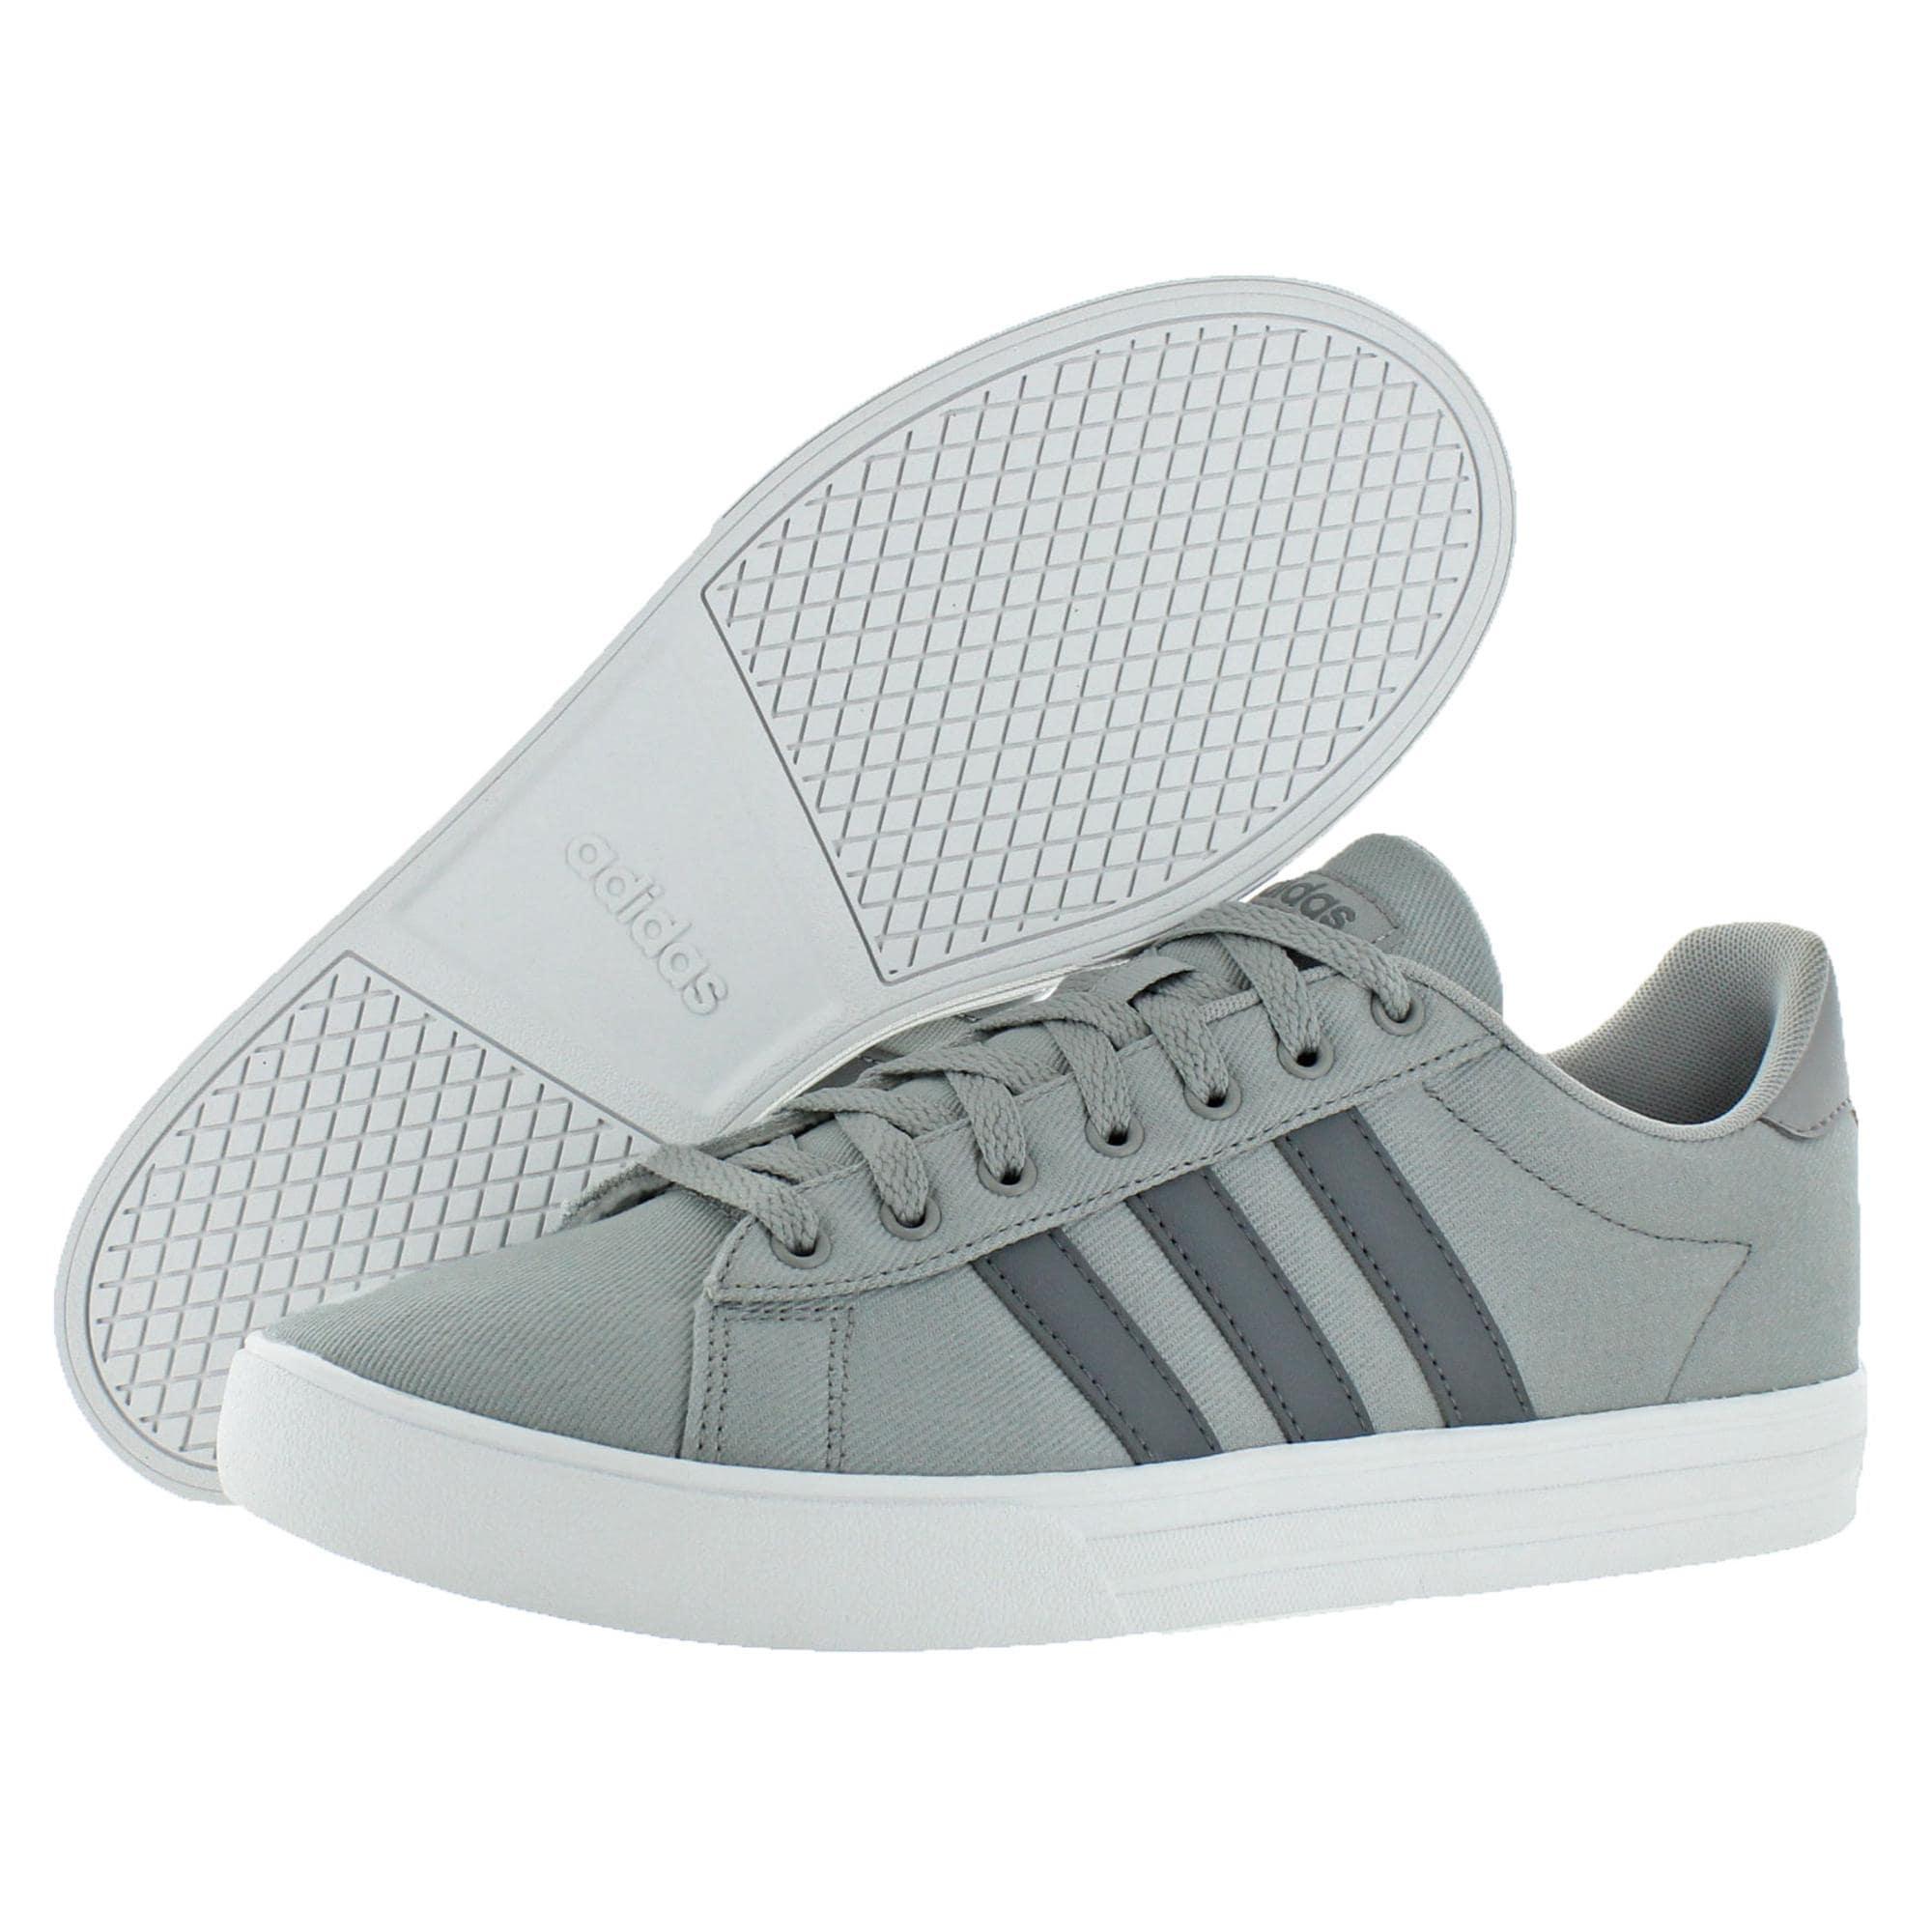 Shop Black Friday Deals on Adidas Mens